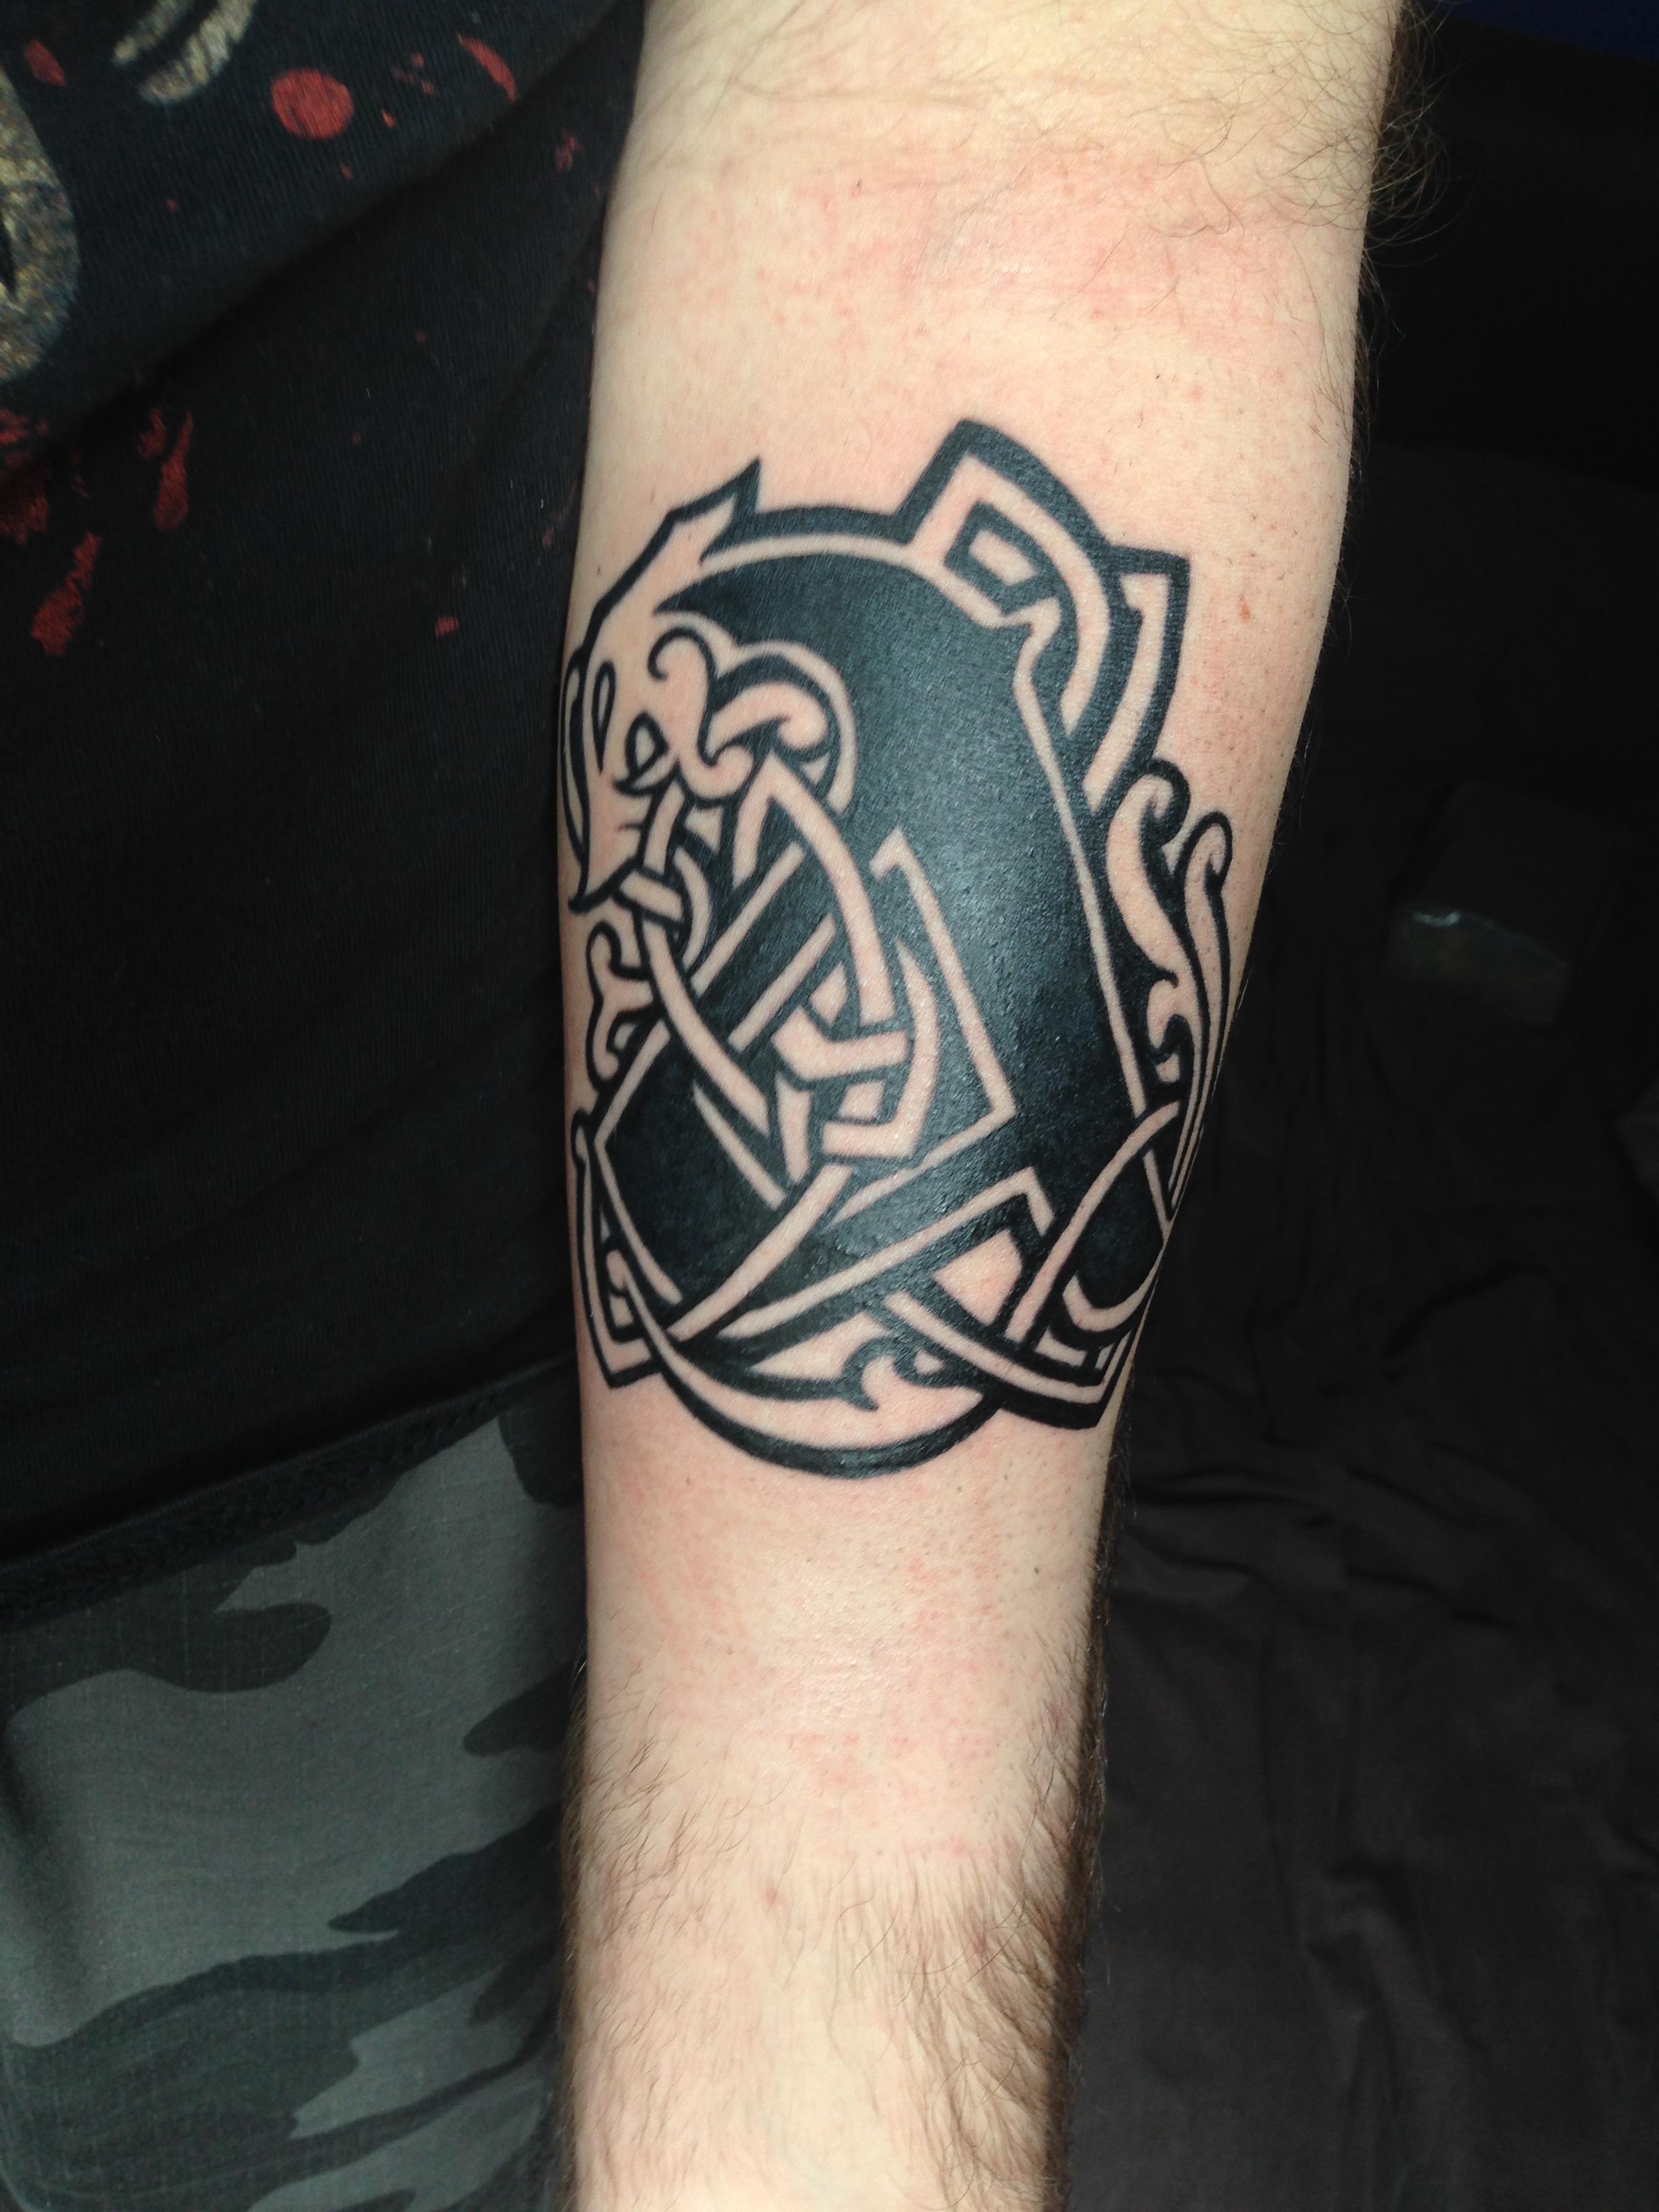 amon amarth tattoo - Google zoeken | Nordic tattoo